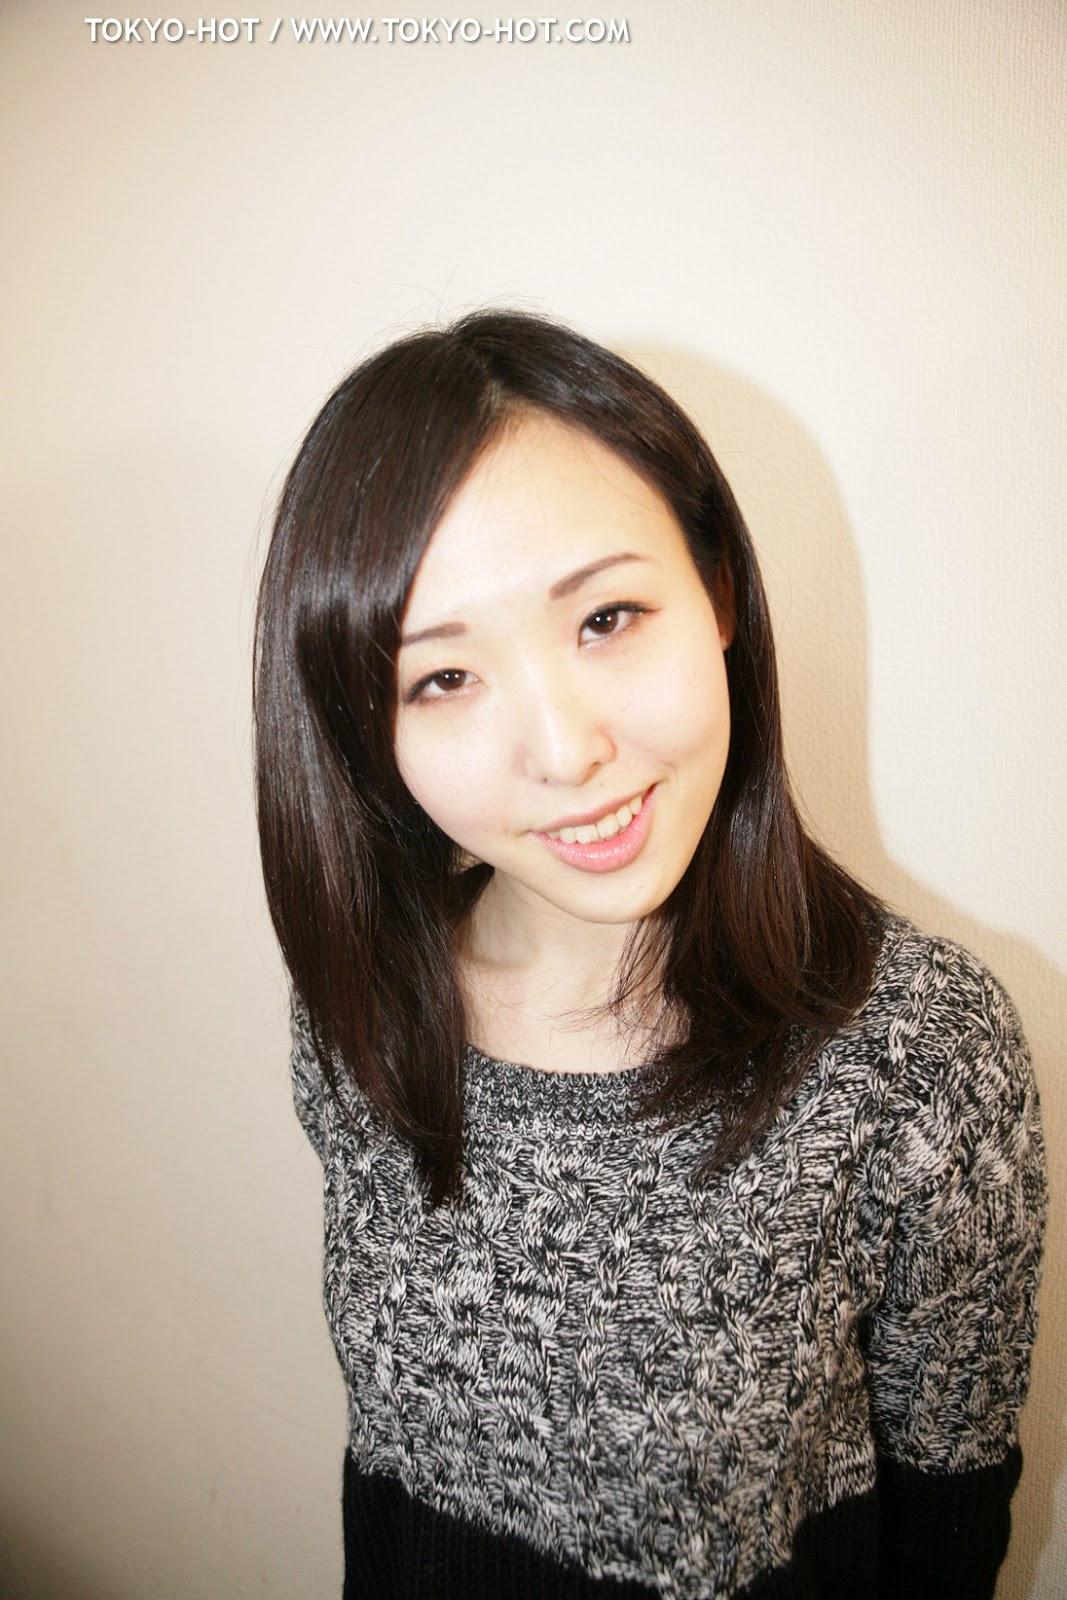 [HD 1.4G] Tokyo Hot k0823 餌食牝 伊藤遥希  Haruki Ito